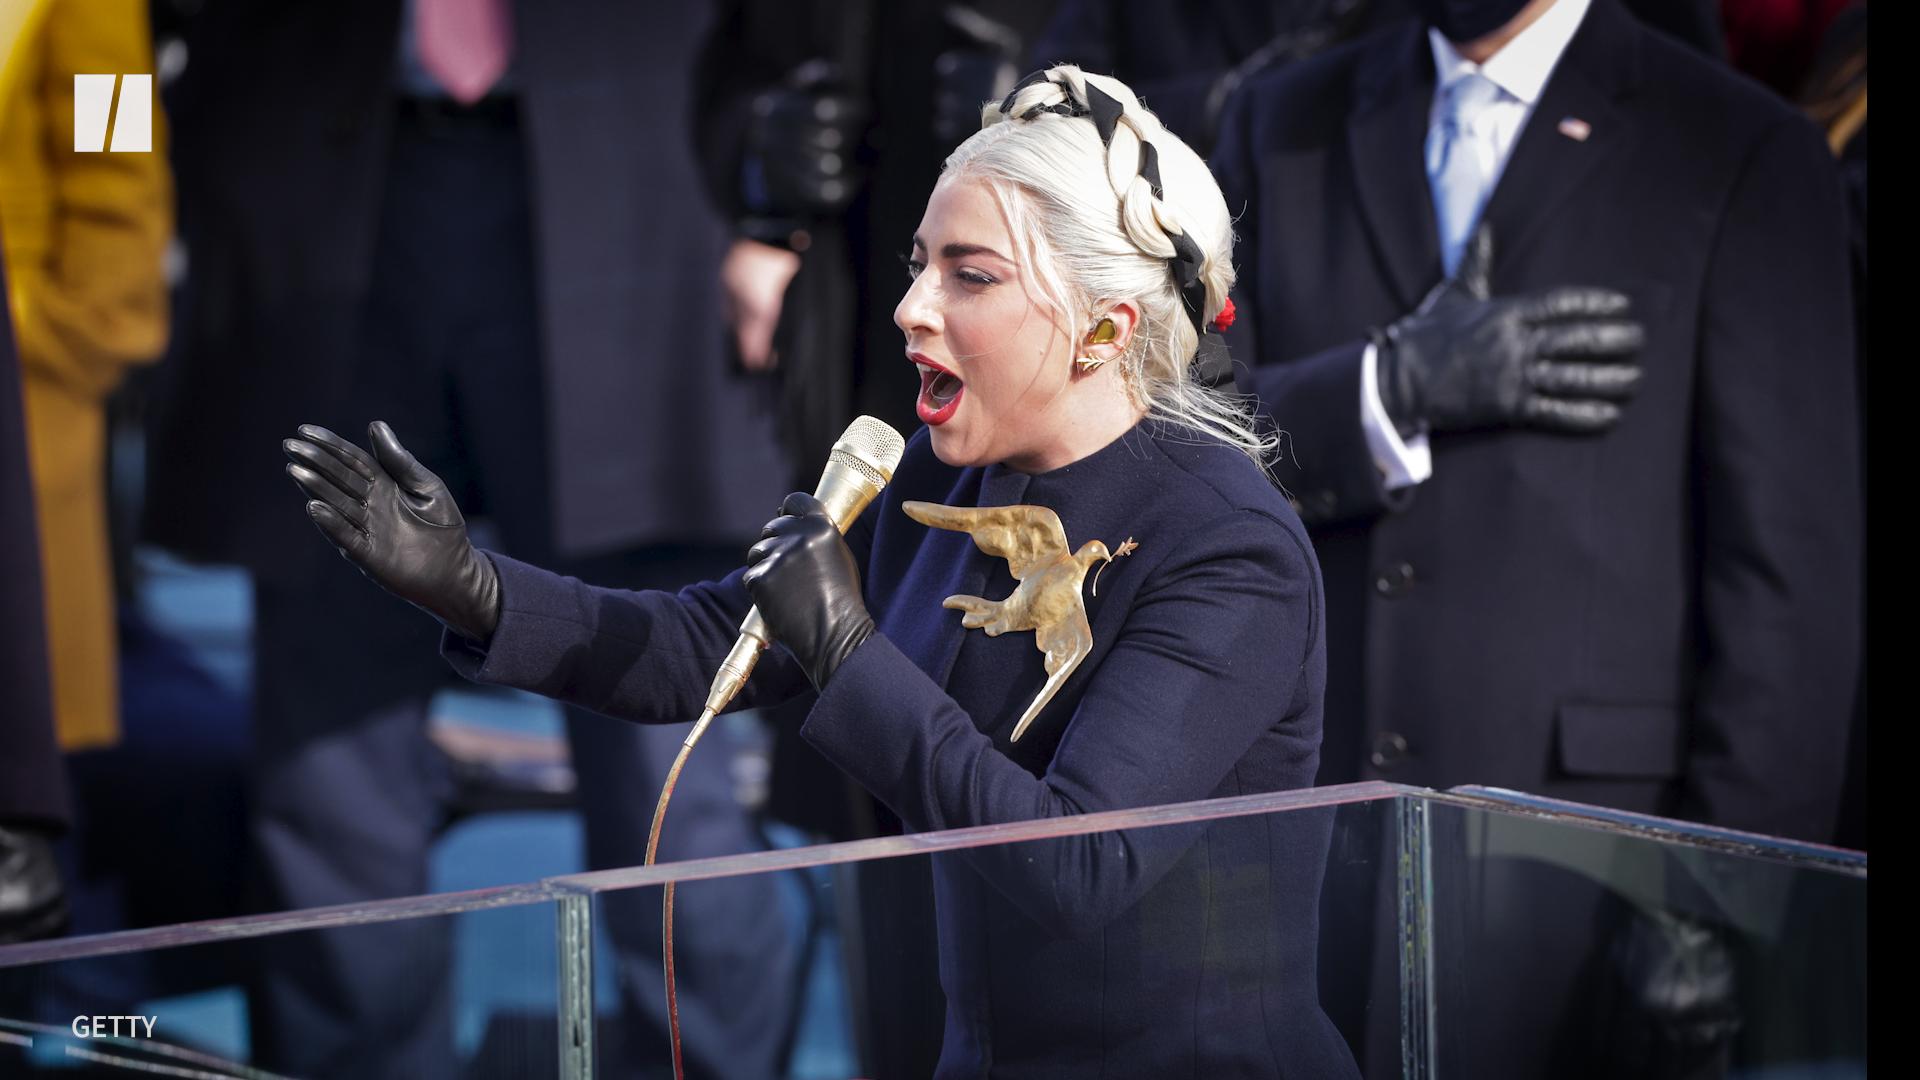 Lady Gaga Performs Powerful National Anthem Rendition